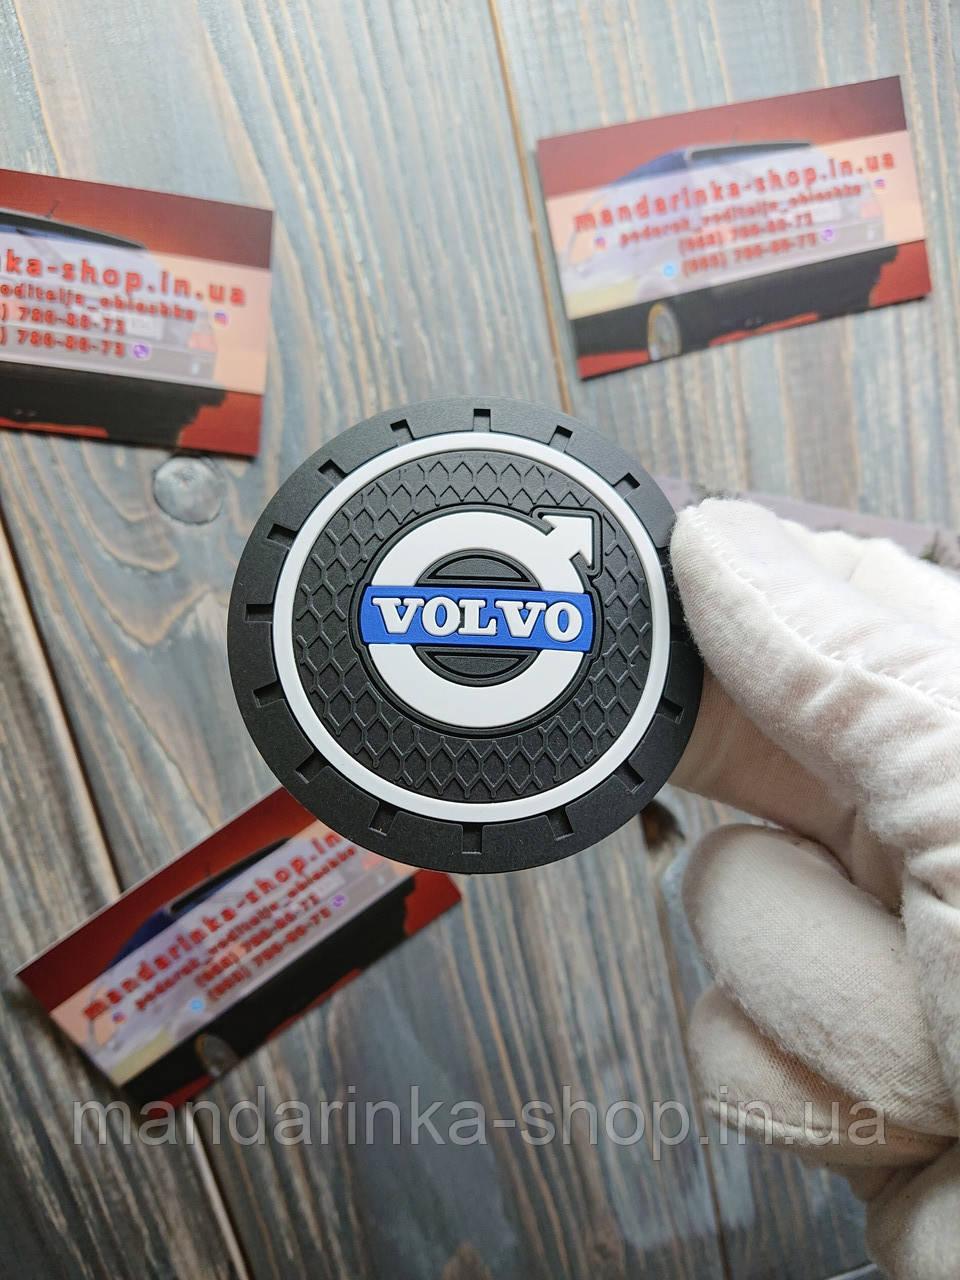 Антискользящим коврик в подстаканники Volvo (Вольво)